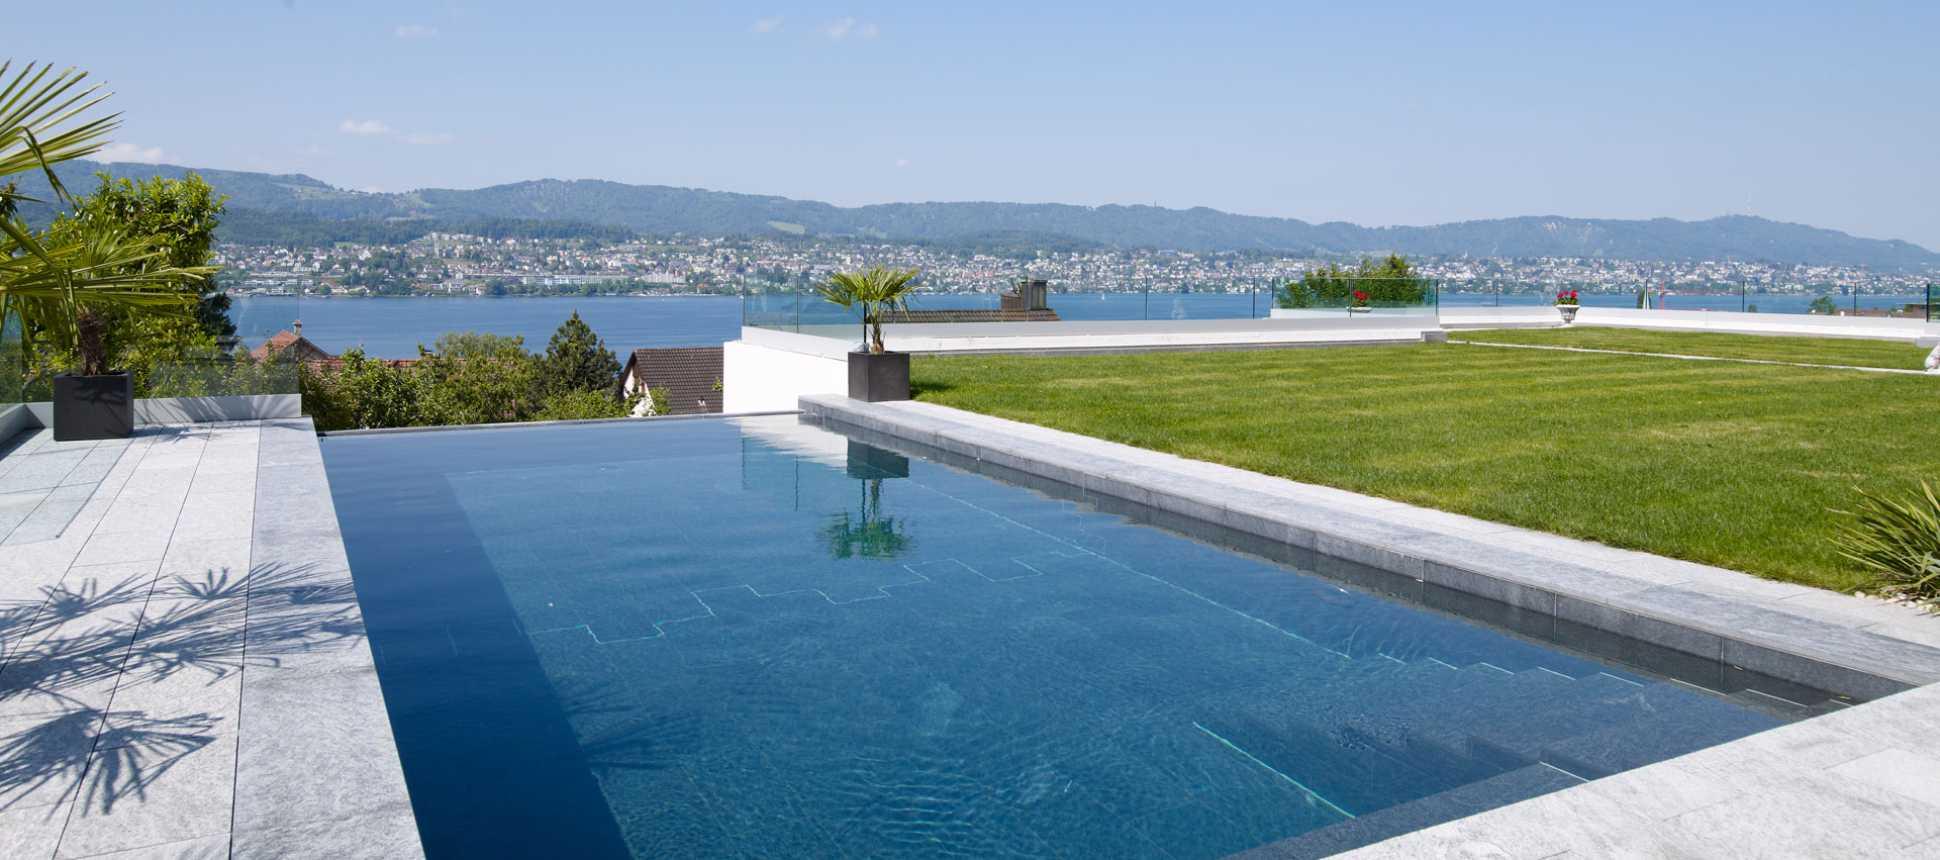 Ein traum aus granit ac schwimmbadtechnik - Swimmingpool edelstahl ...